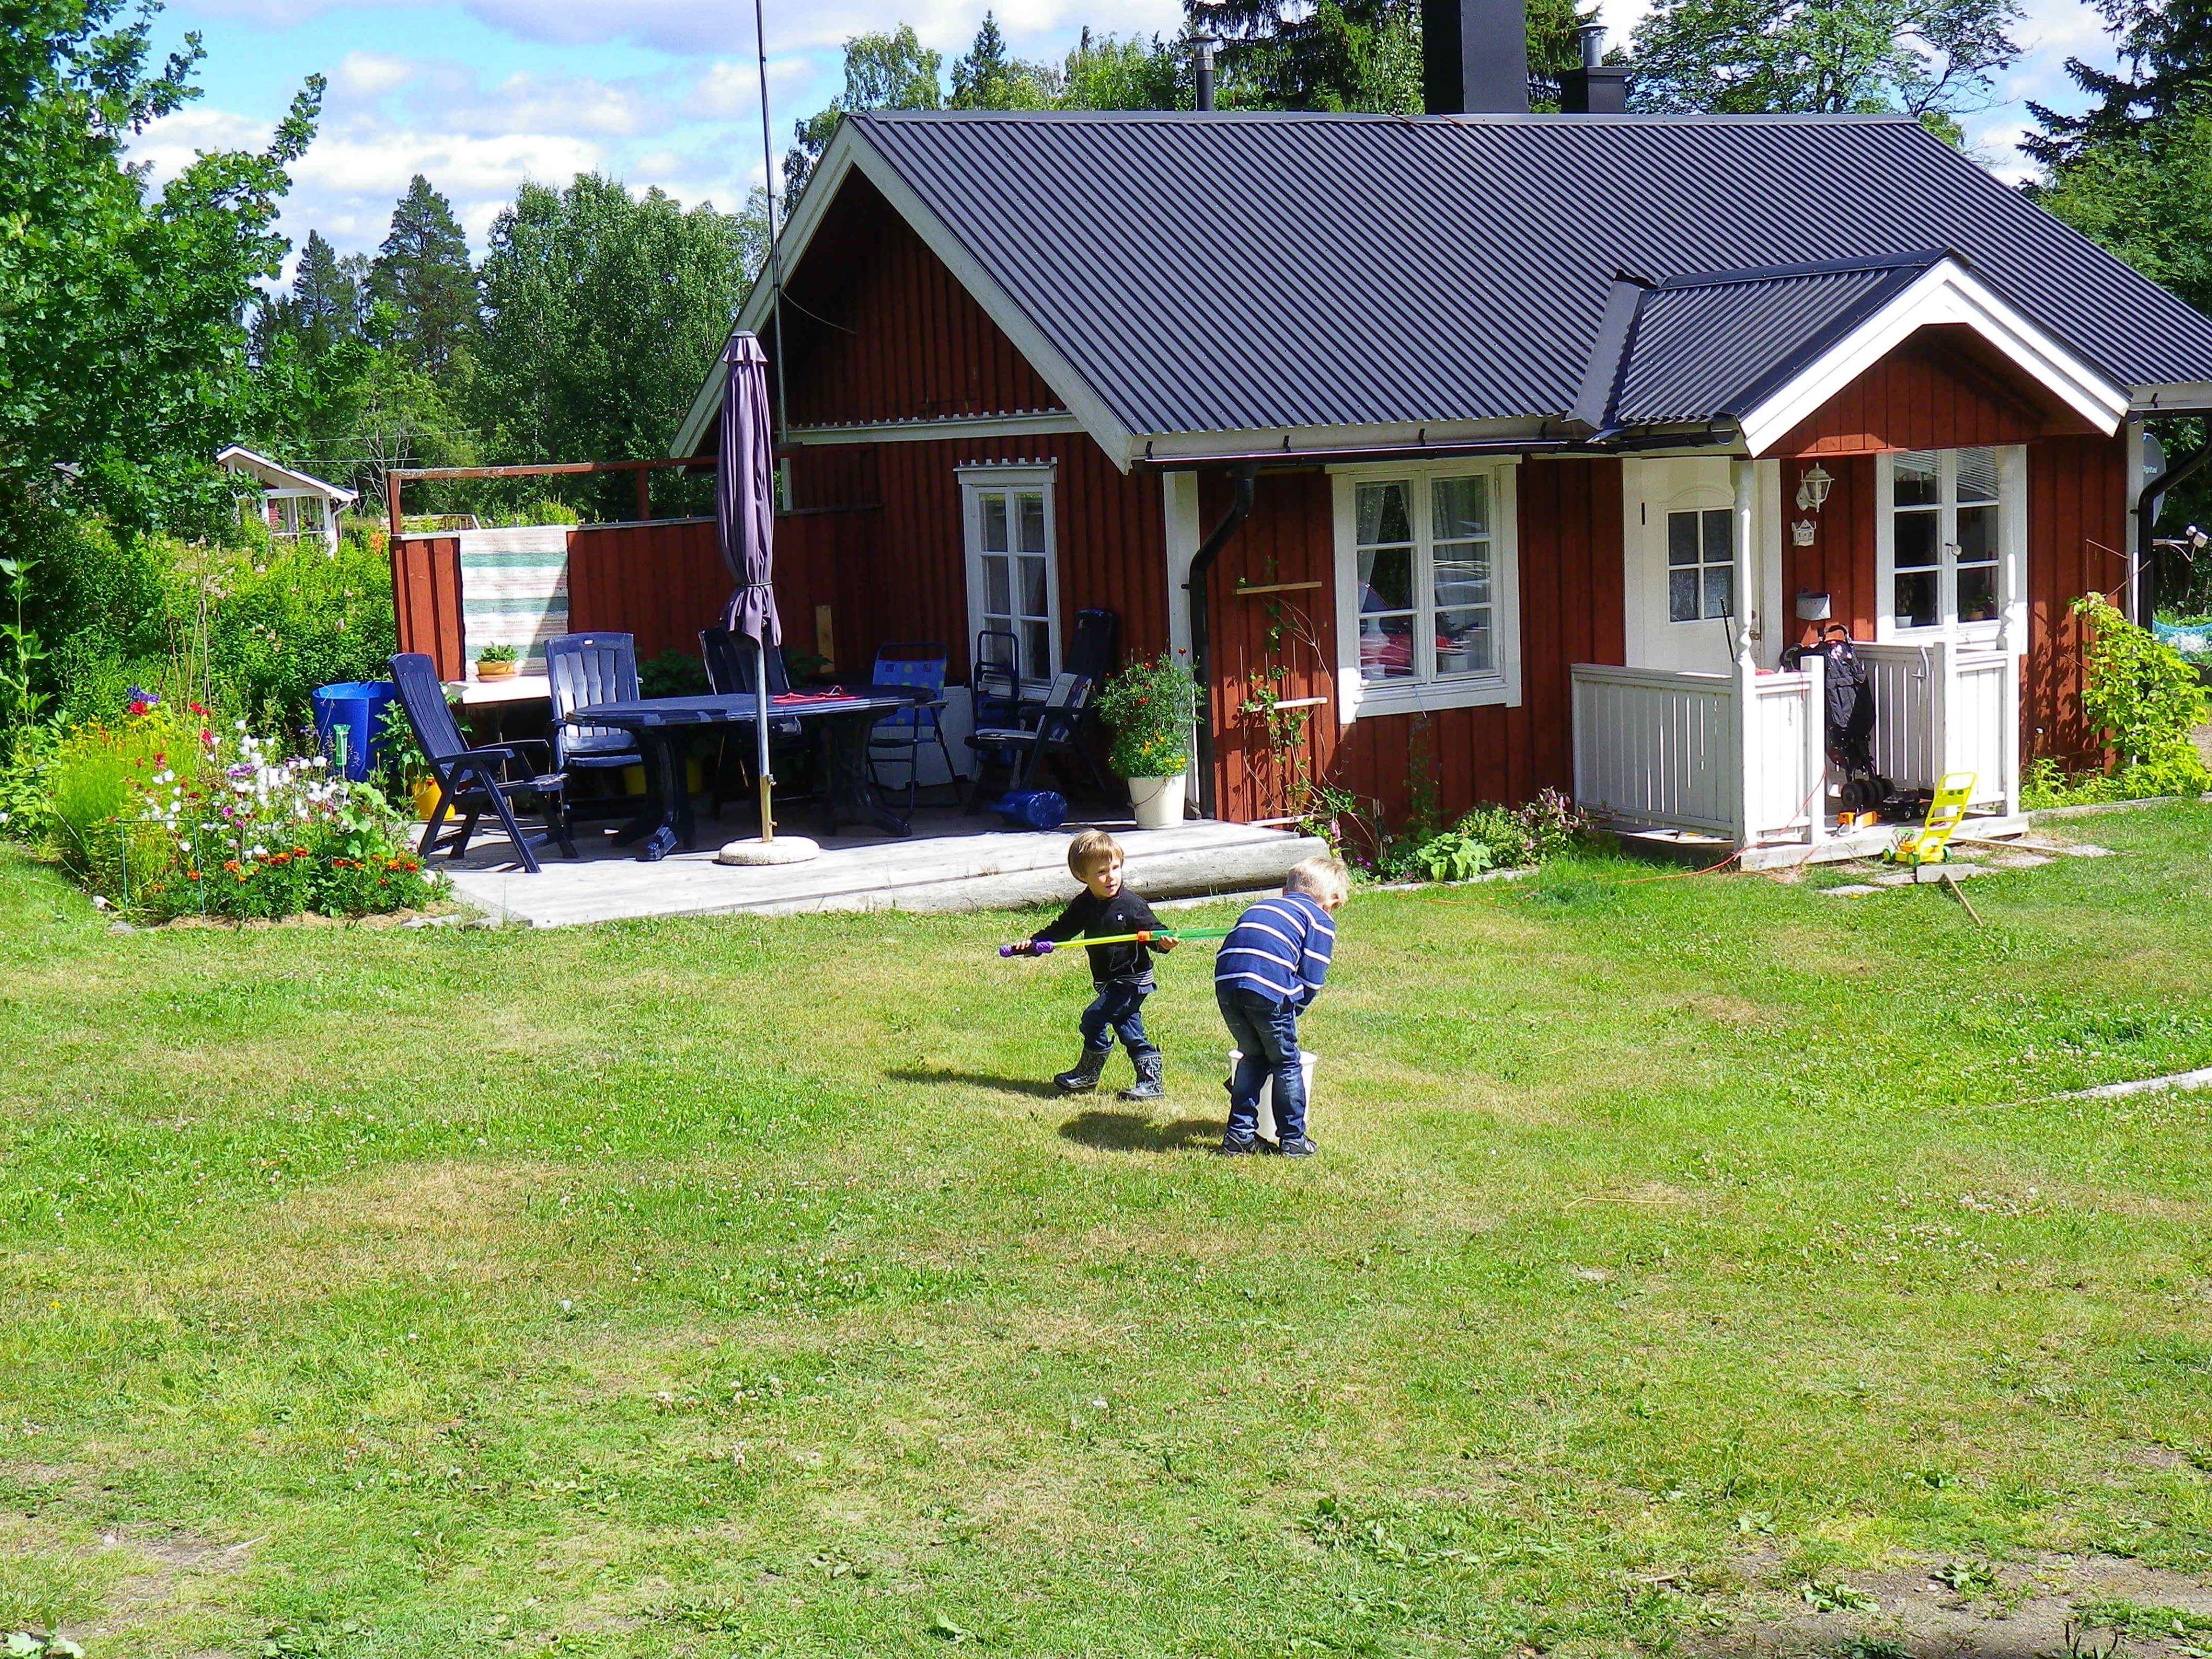 S1307 Bäck, Bjästa